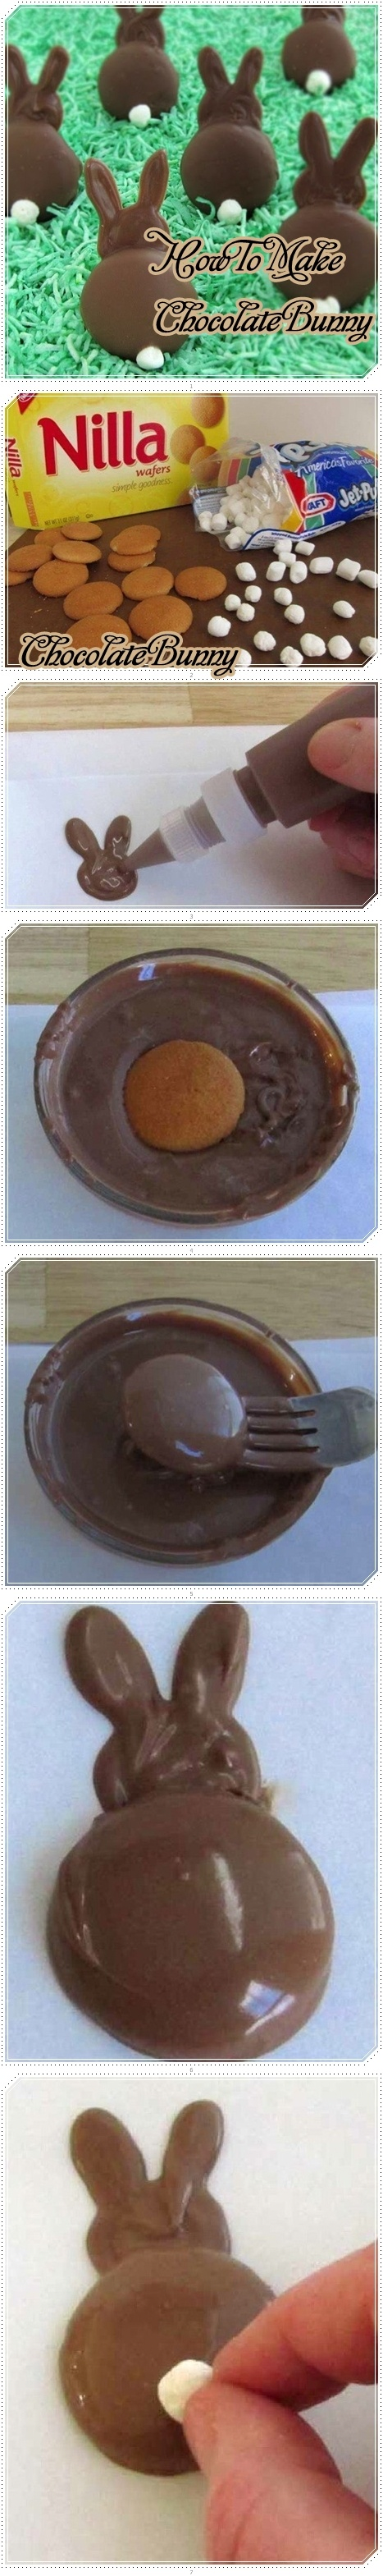 How to Make ---> Chocolate Bunny